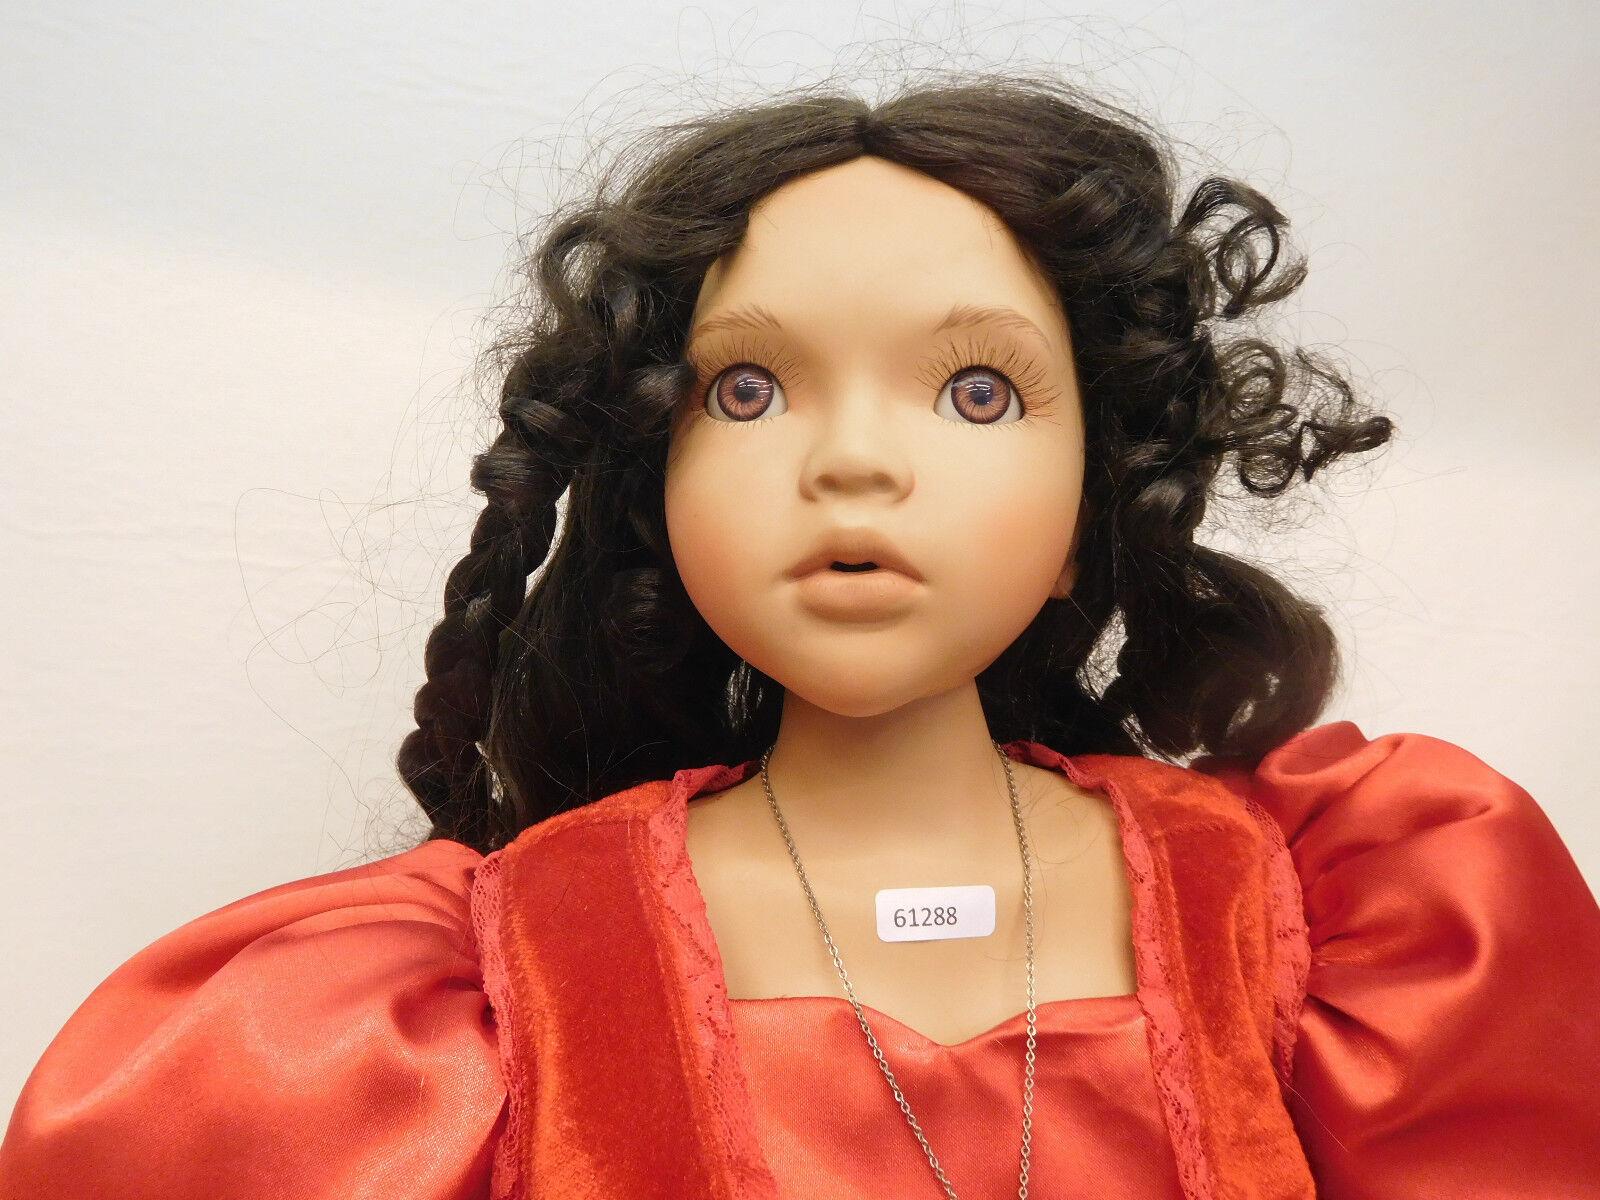 Mes61288 ESI artisti bambola di größleSchmidt Stella autoatteri arieti